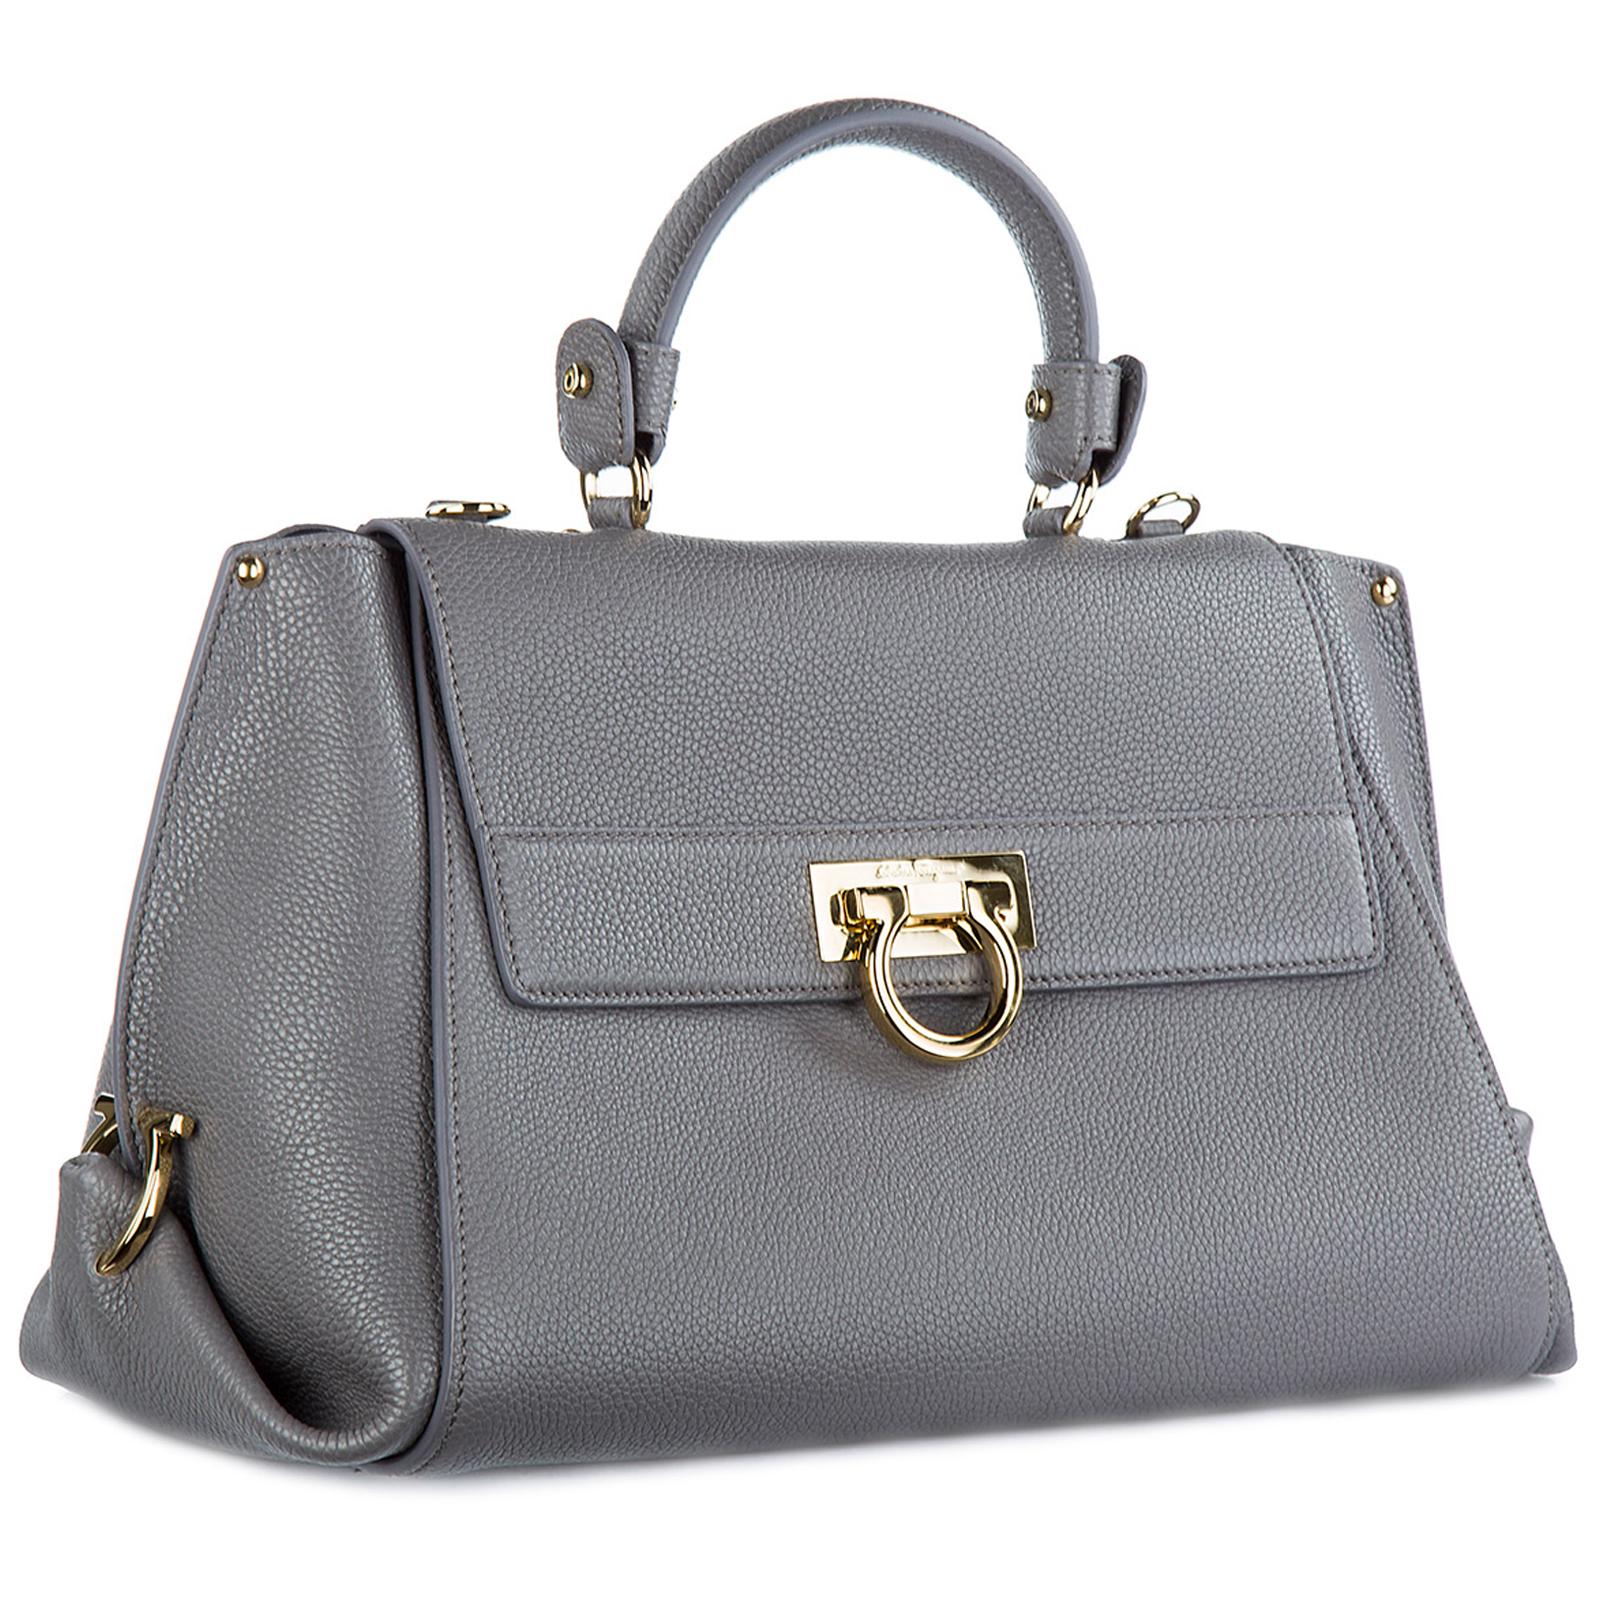 149ba93901 Handbag Salvatore Ferragamo Sofia 21F606670869 urban grey - fumee ...